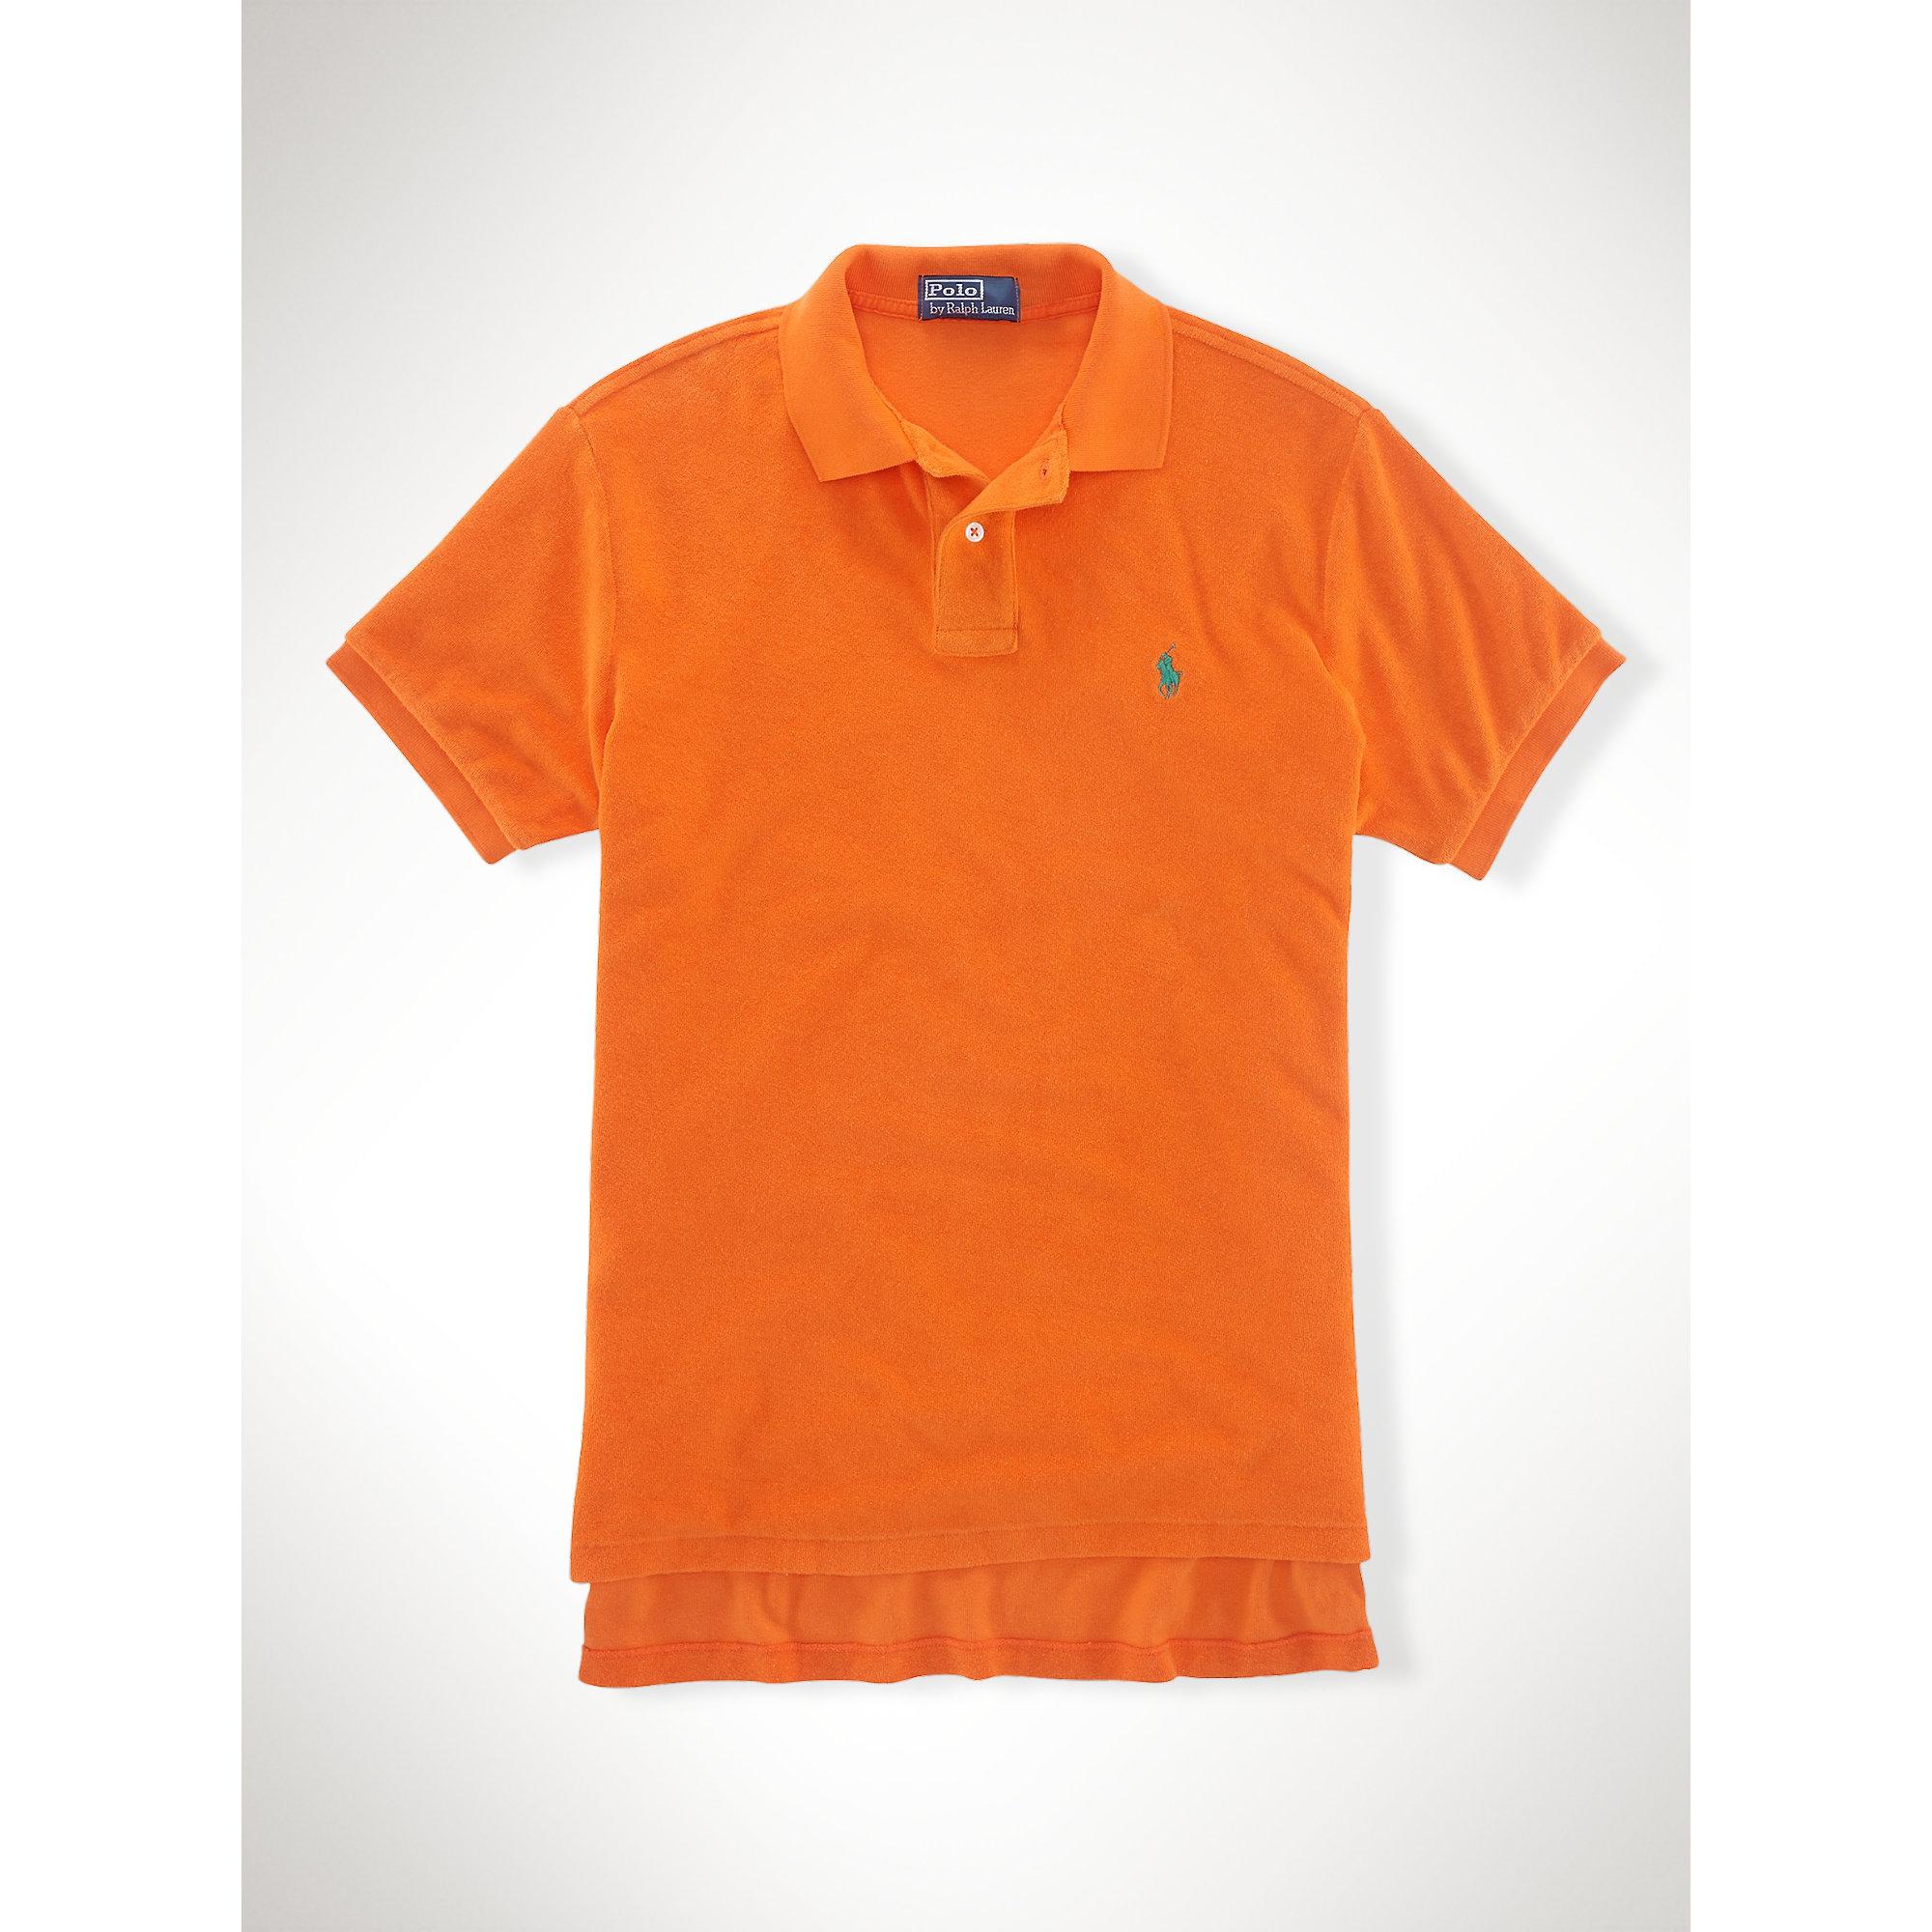 Lyst - Polo Ralph Lauren Custom-fit Terry Cloth Polo in Orange for Men dbe822cbdf21